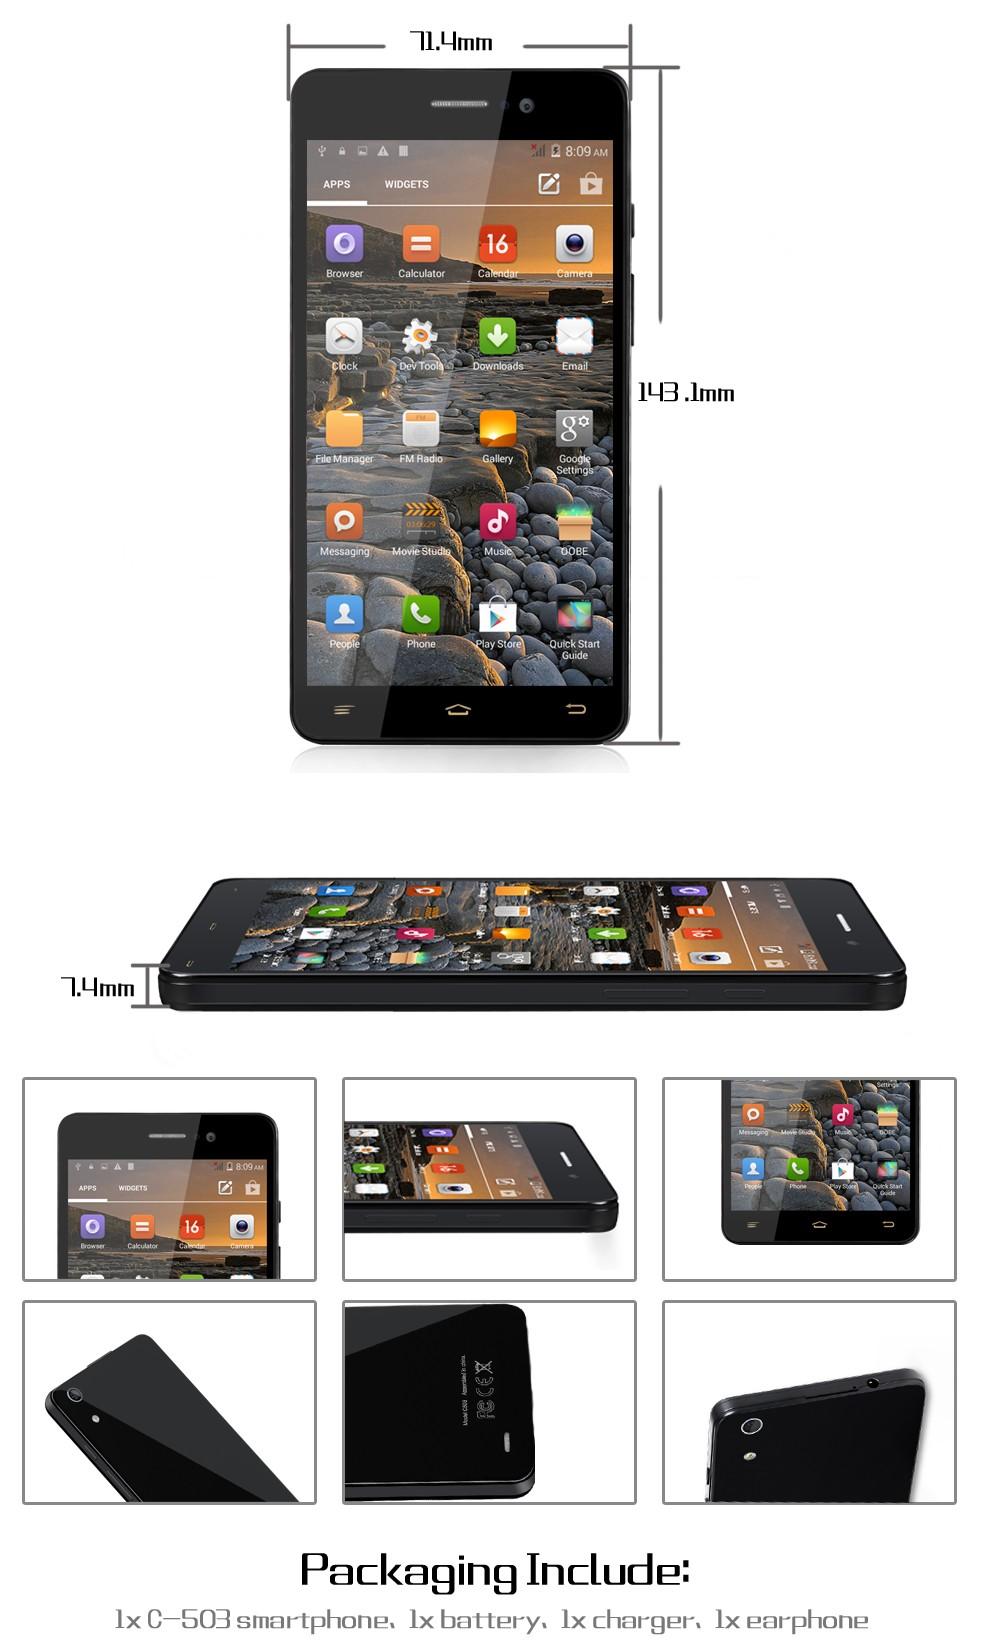 "ONN 5.0 Inch Original "" Smartphone MTK6582 Quad Core Android 4.4.2 1GB RAM 8GB ROM 1280*720 Dual SIM cards 3G GPS WIFI Alina"